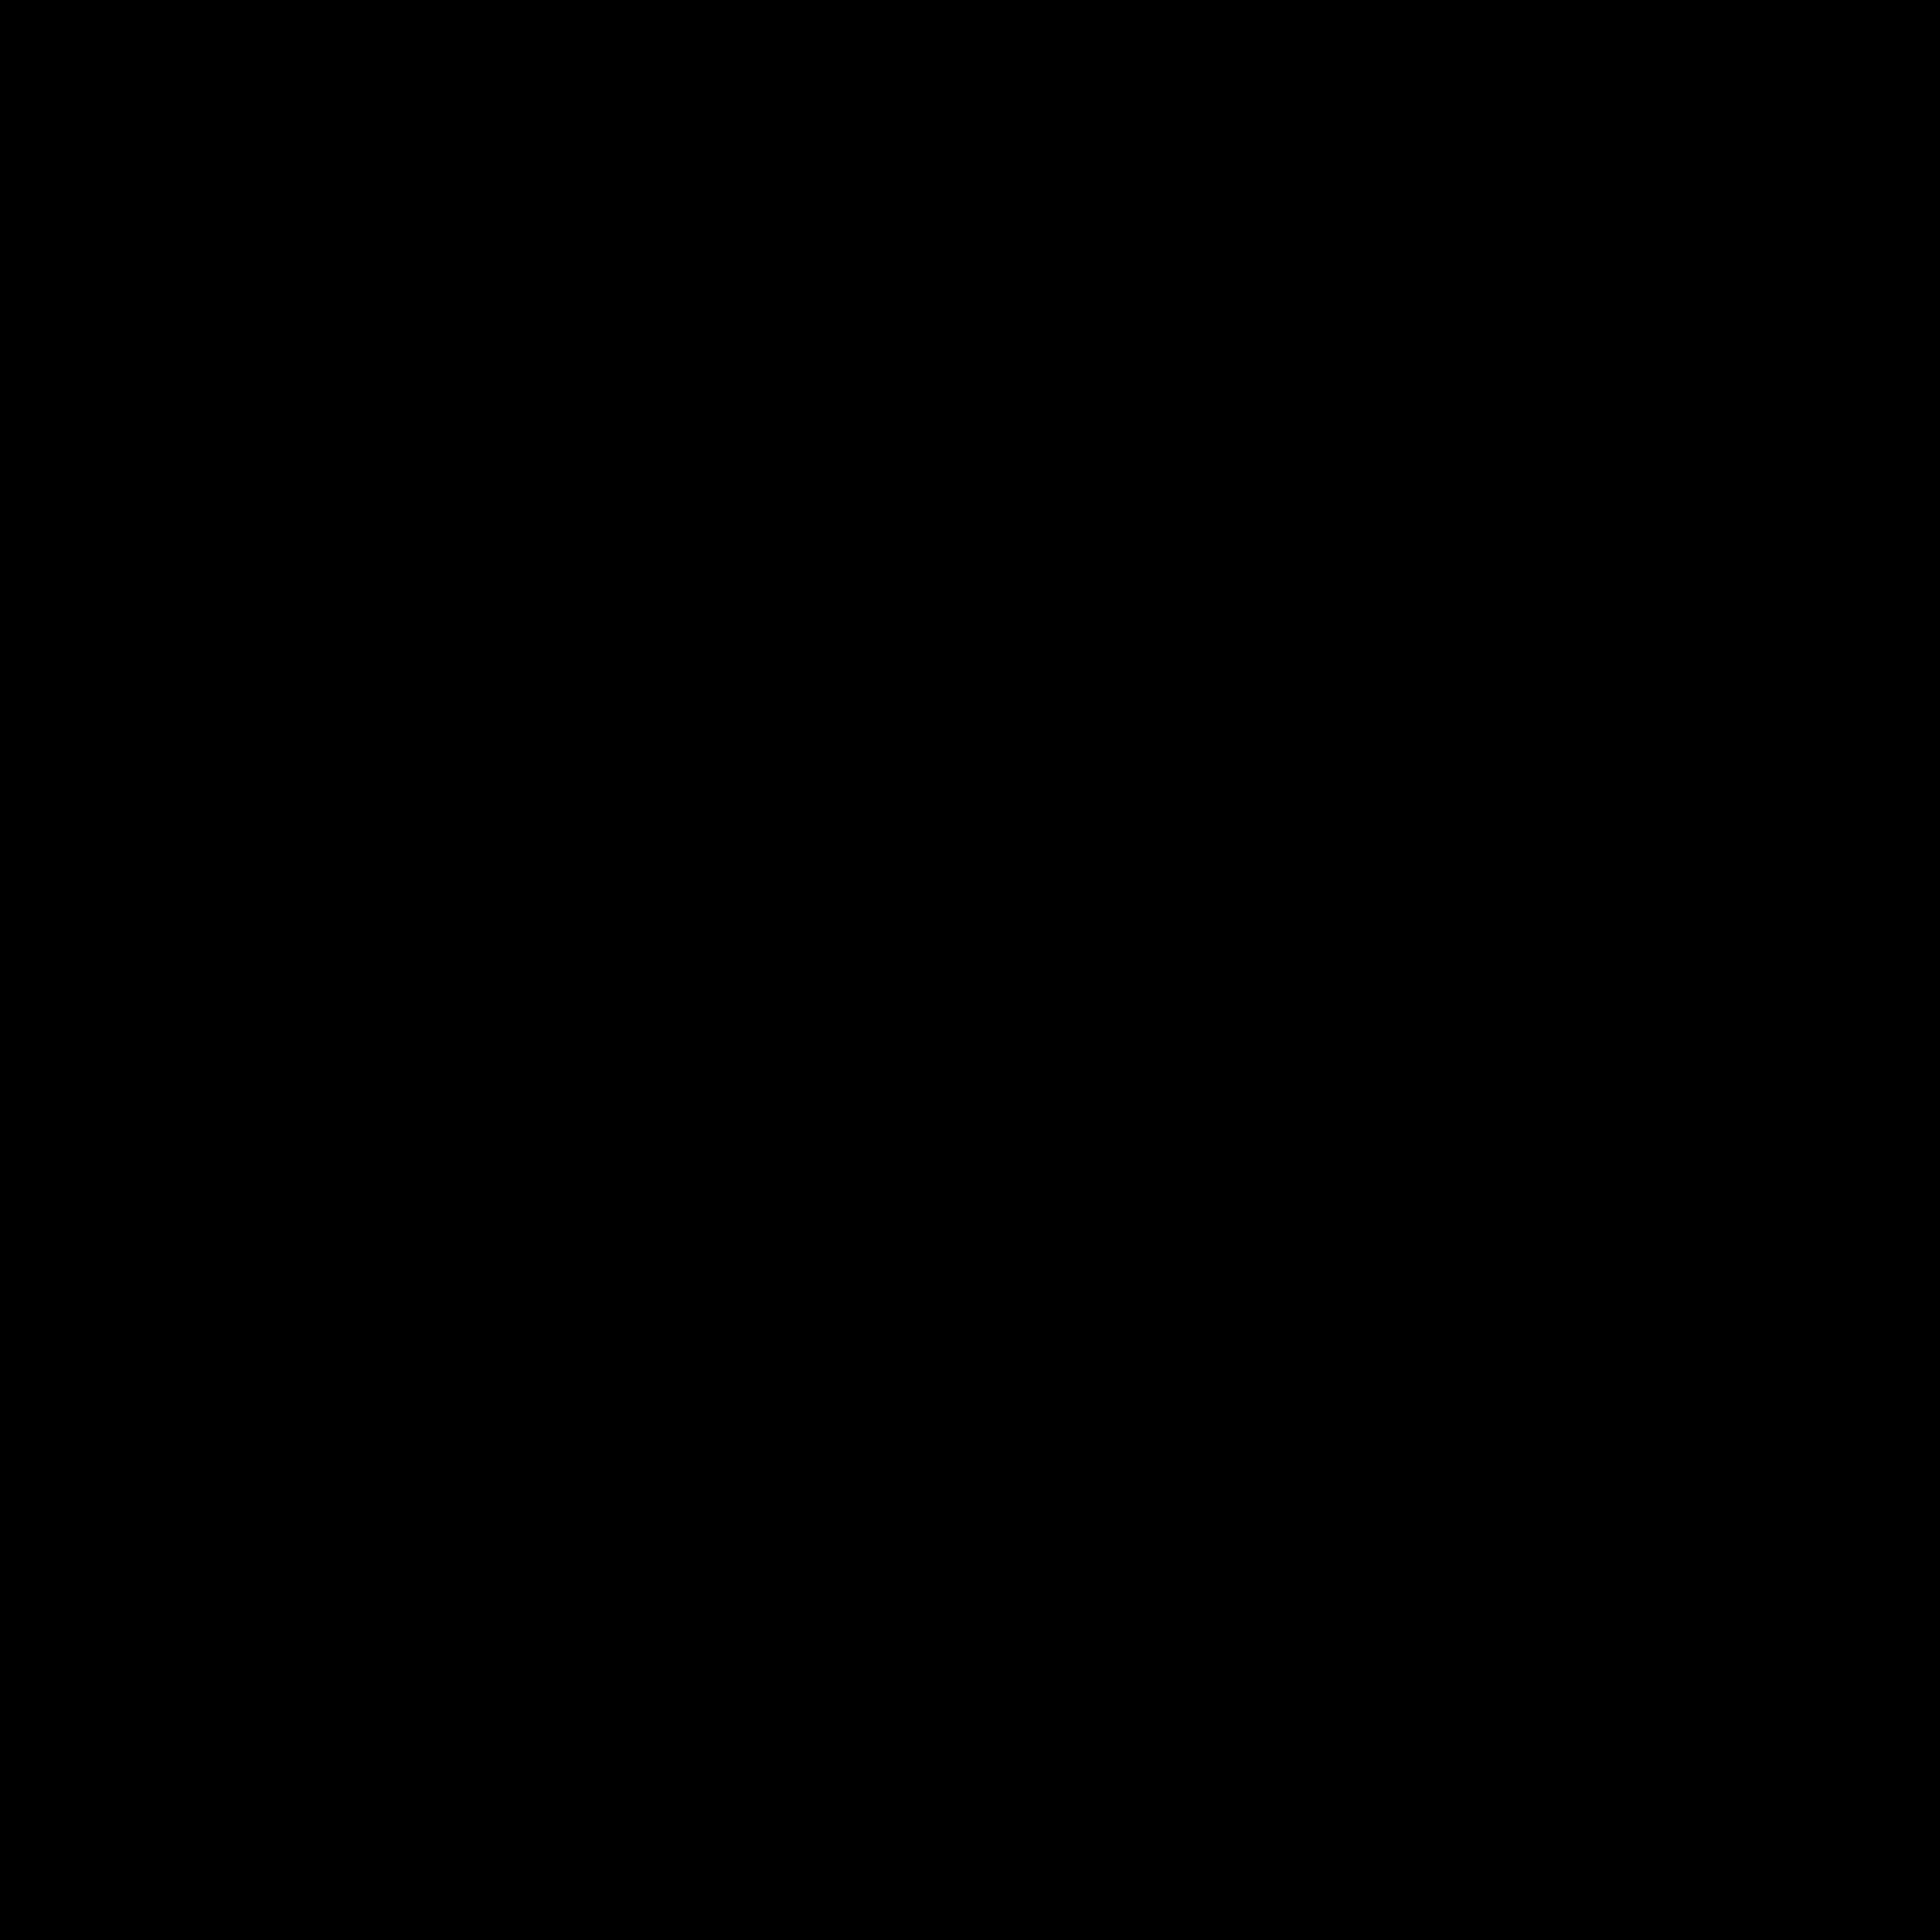 logo instagram bw